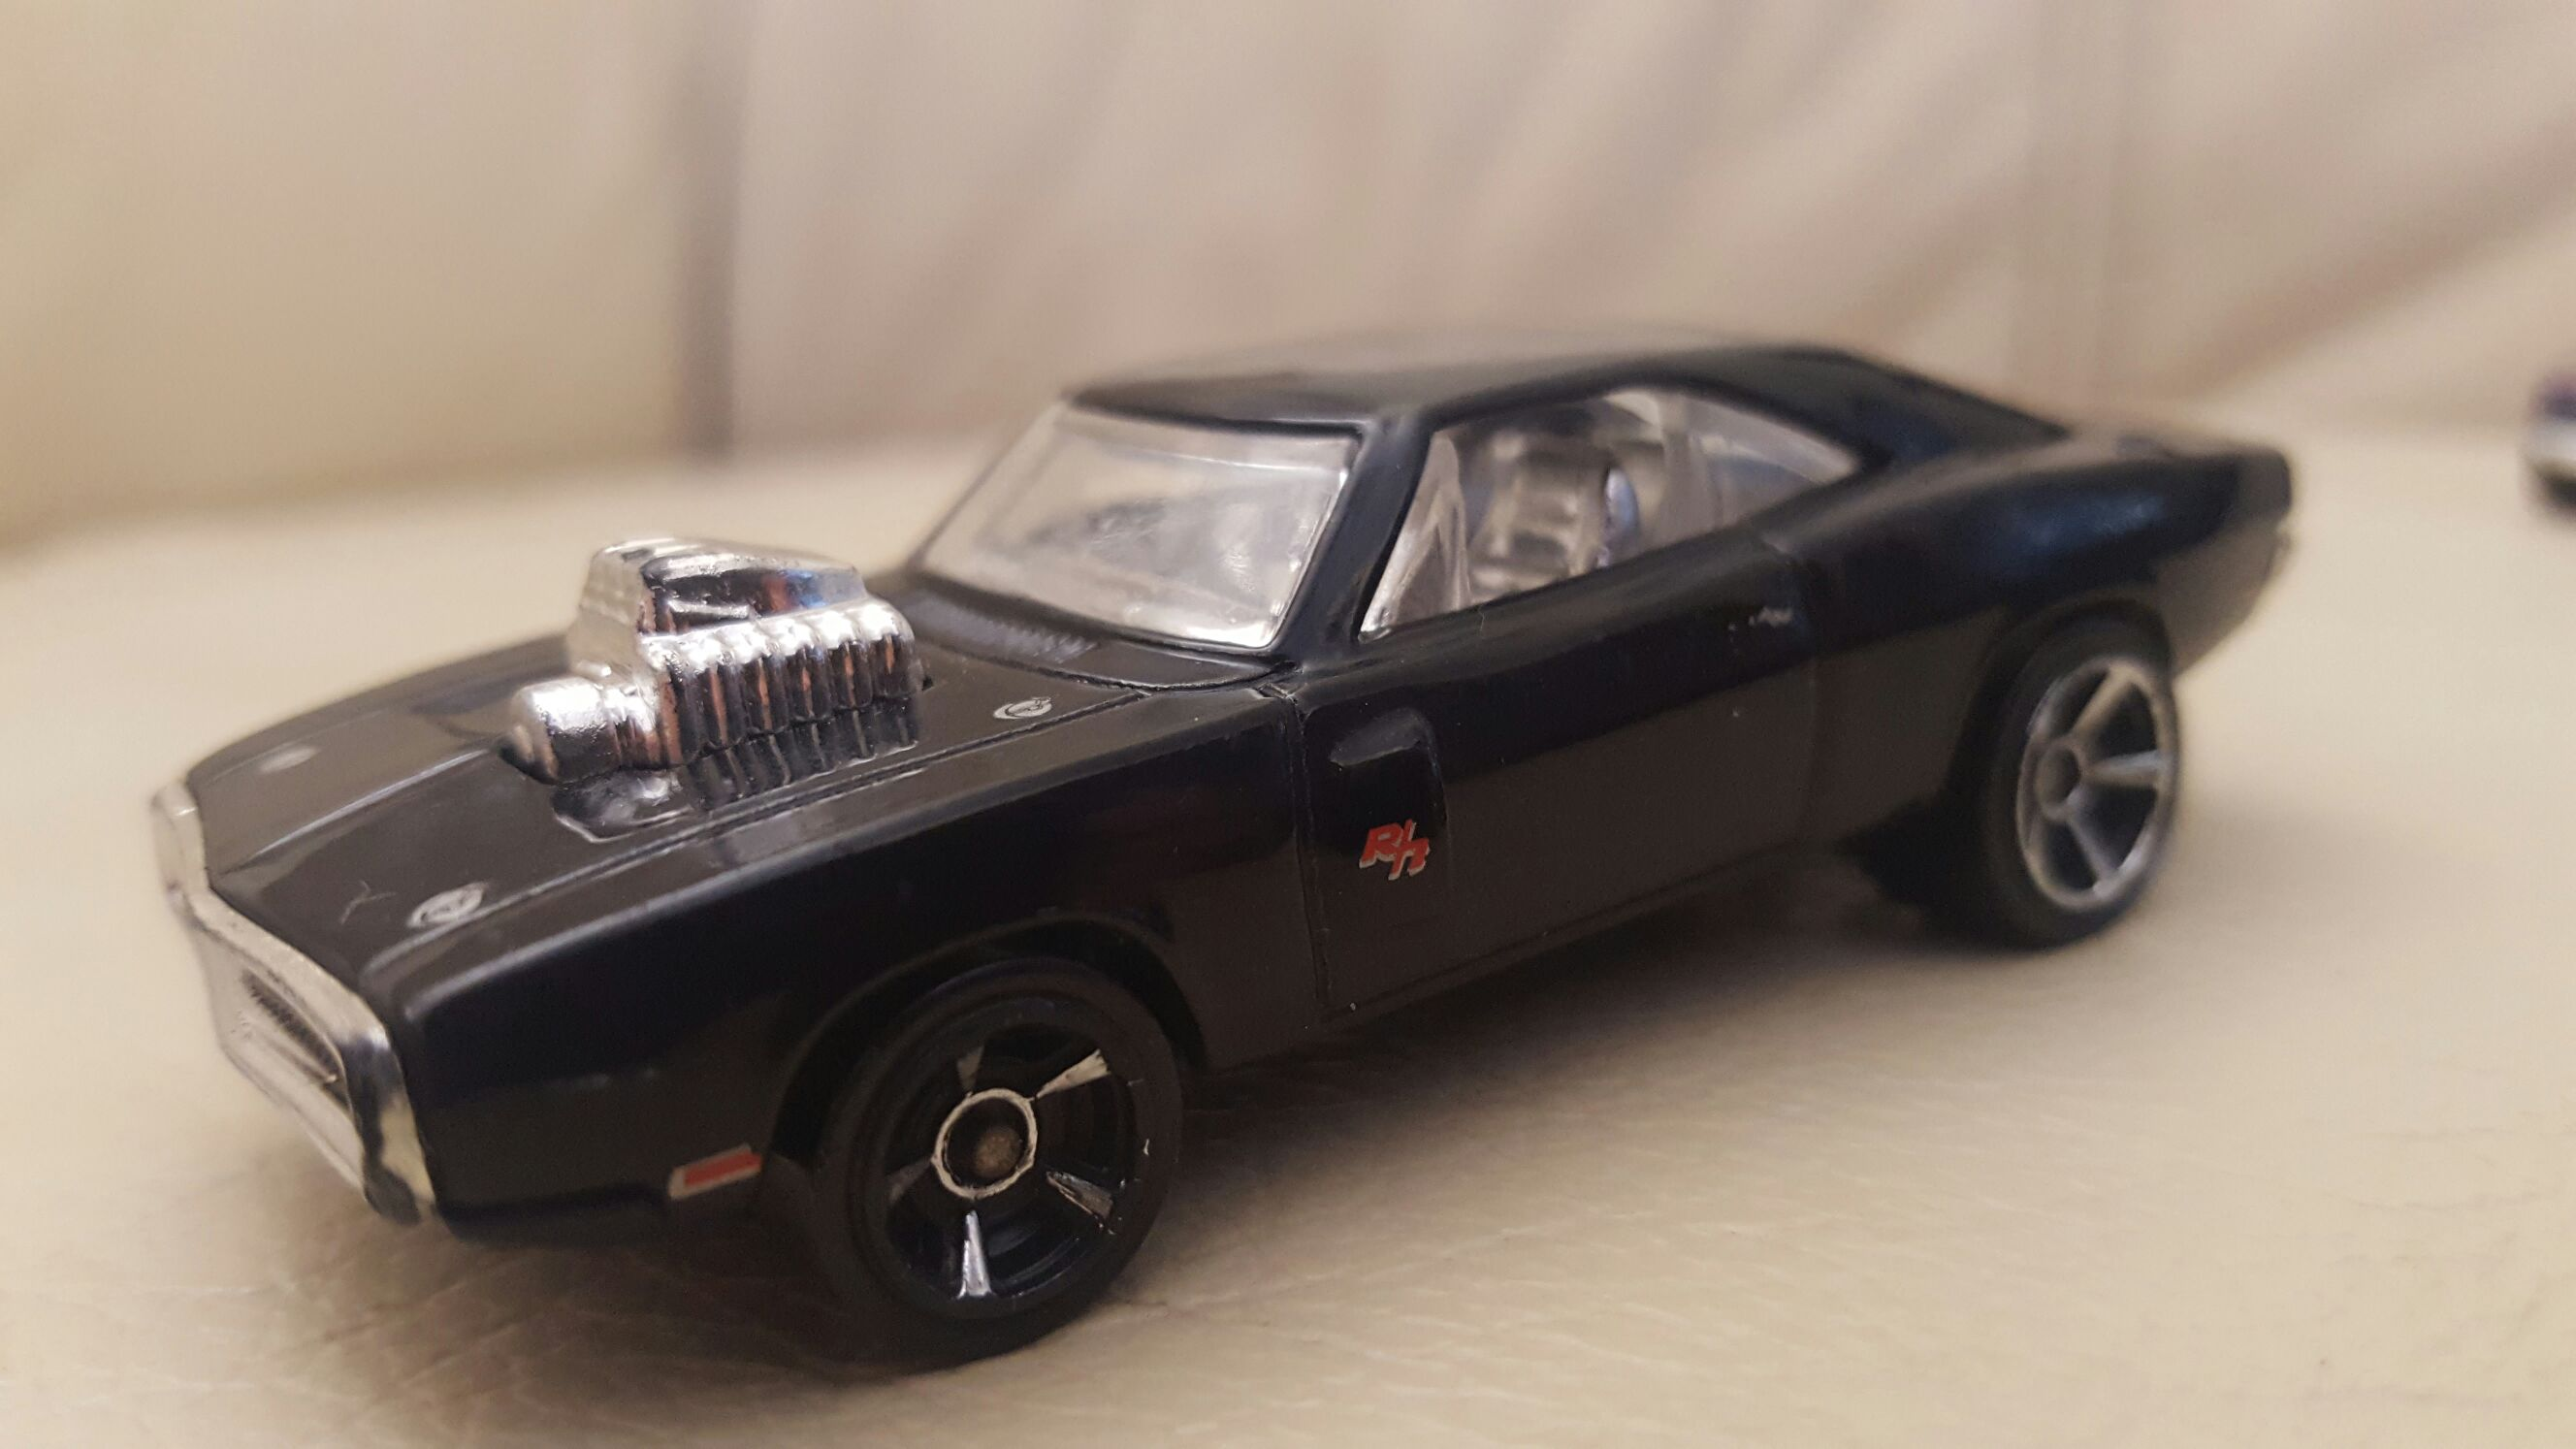 Chrysler Group Llc 2010 Black Toy Car Die Cast And Hot Wheels